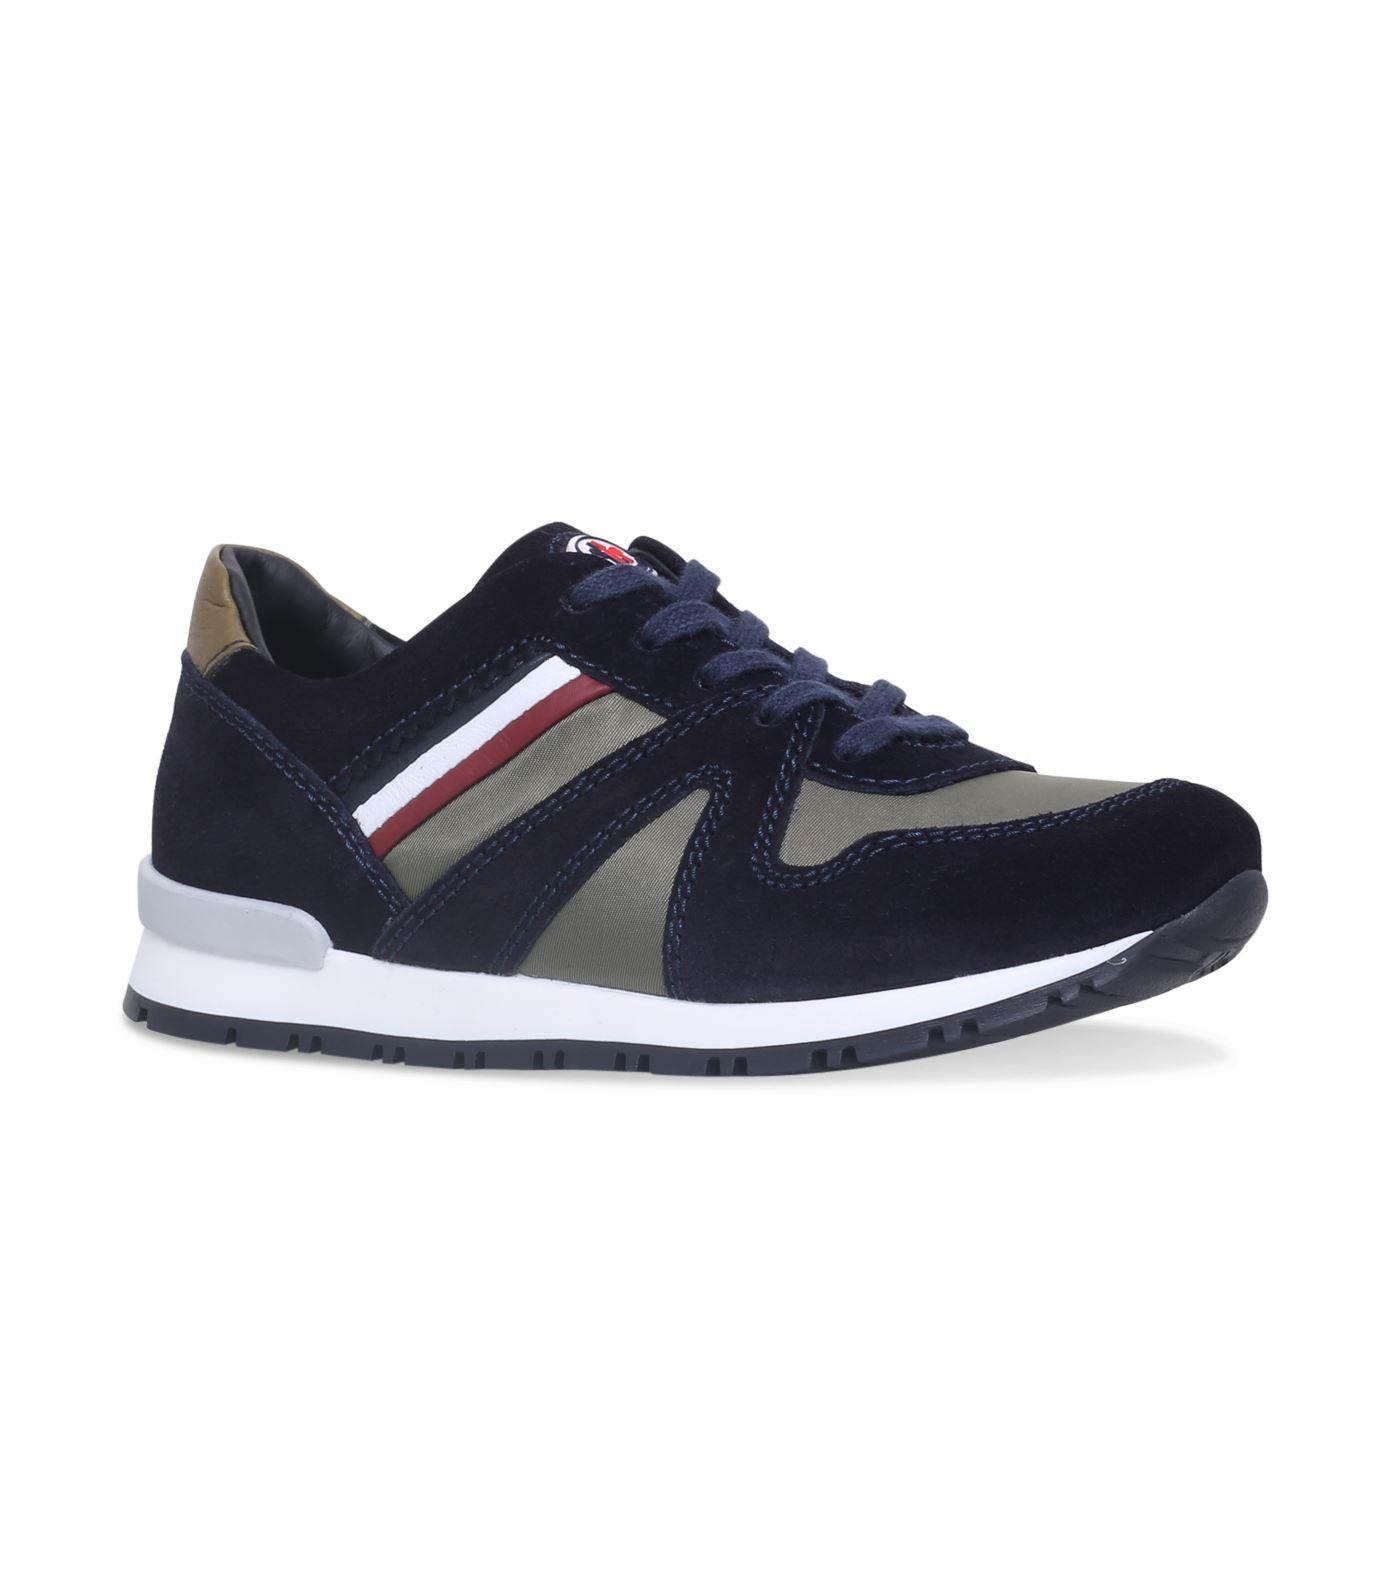 Moncler Fabien Sneakers In Multi